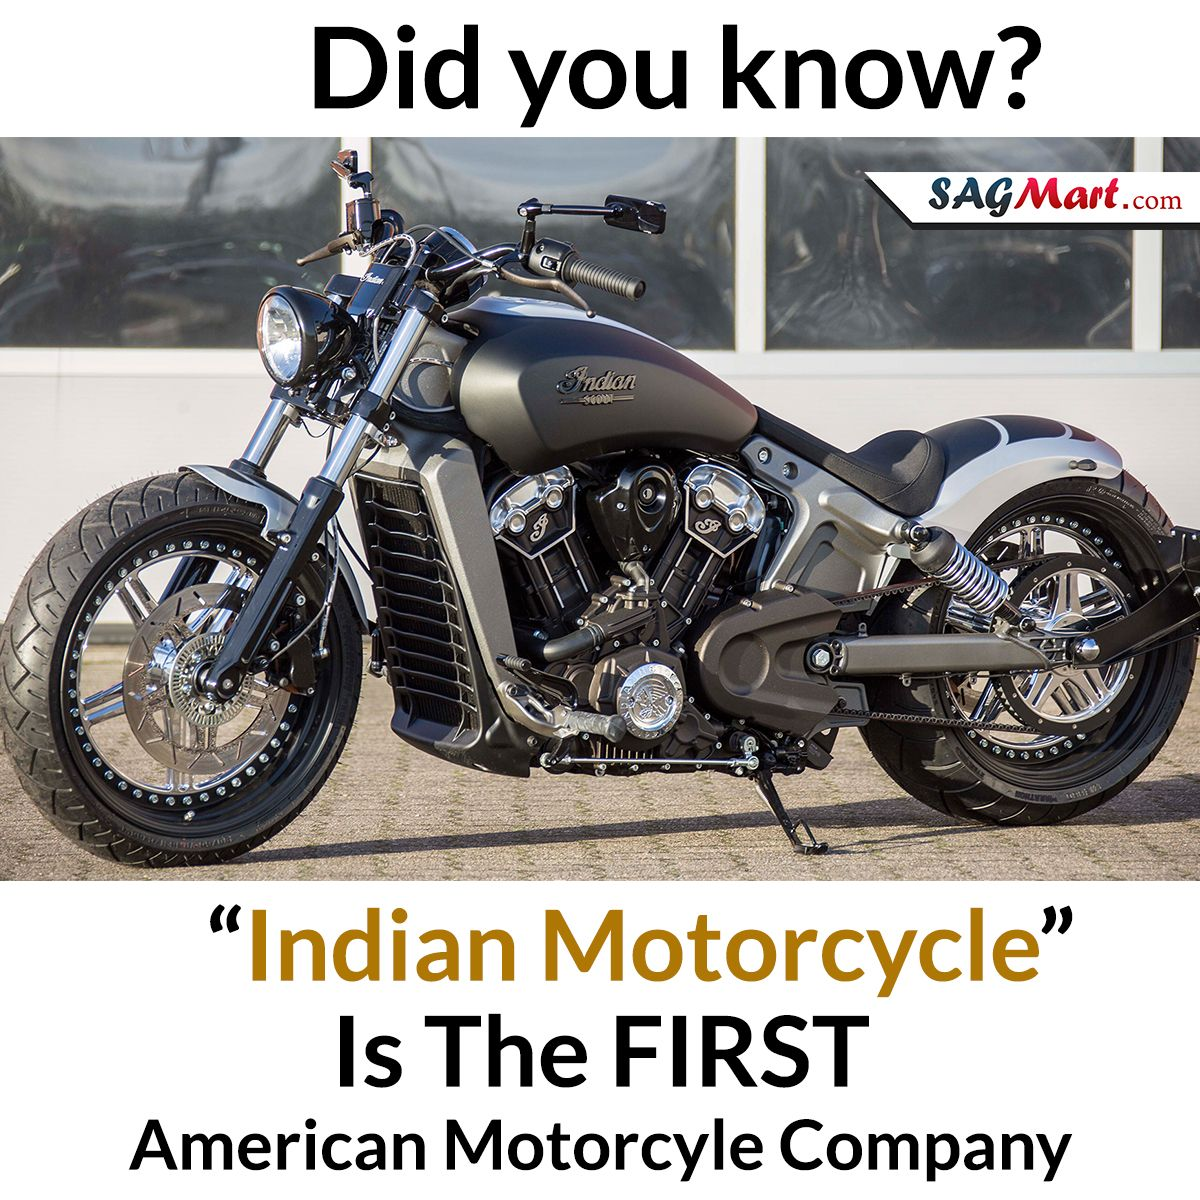 Indian Motorcycle 2019 Bike Models In India Sagmart Indian Motorcycle Indian Motorcycle Scout Motorcycle [ 1200 x 1200 Pixel ]